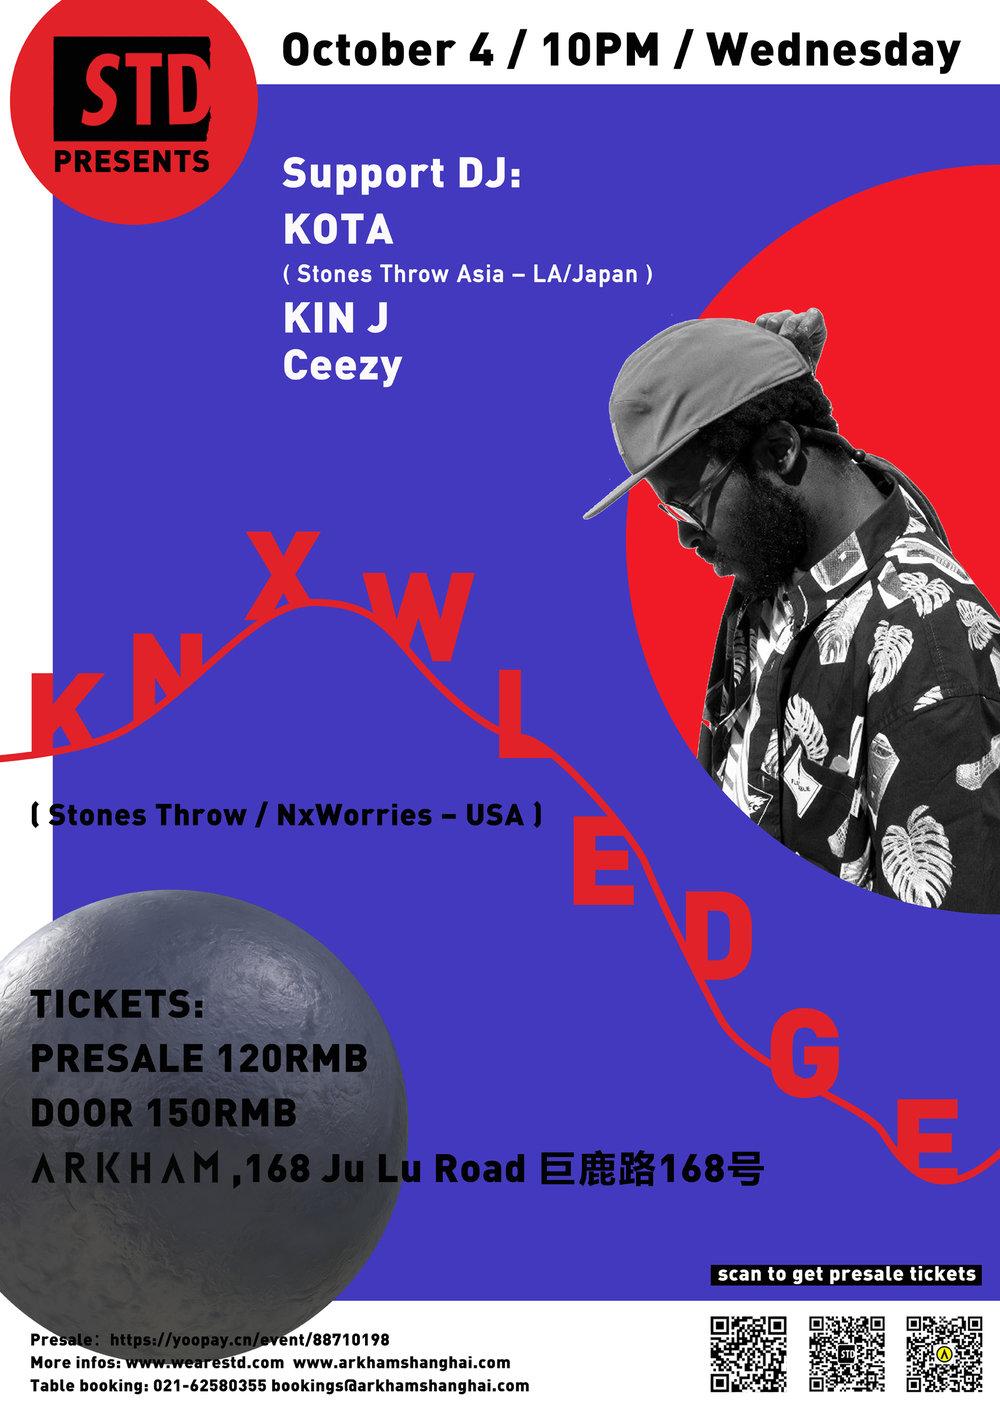 Knxwledge Poster.jpg